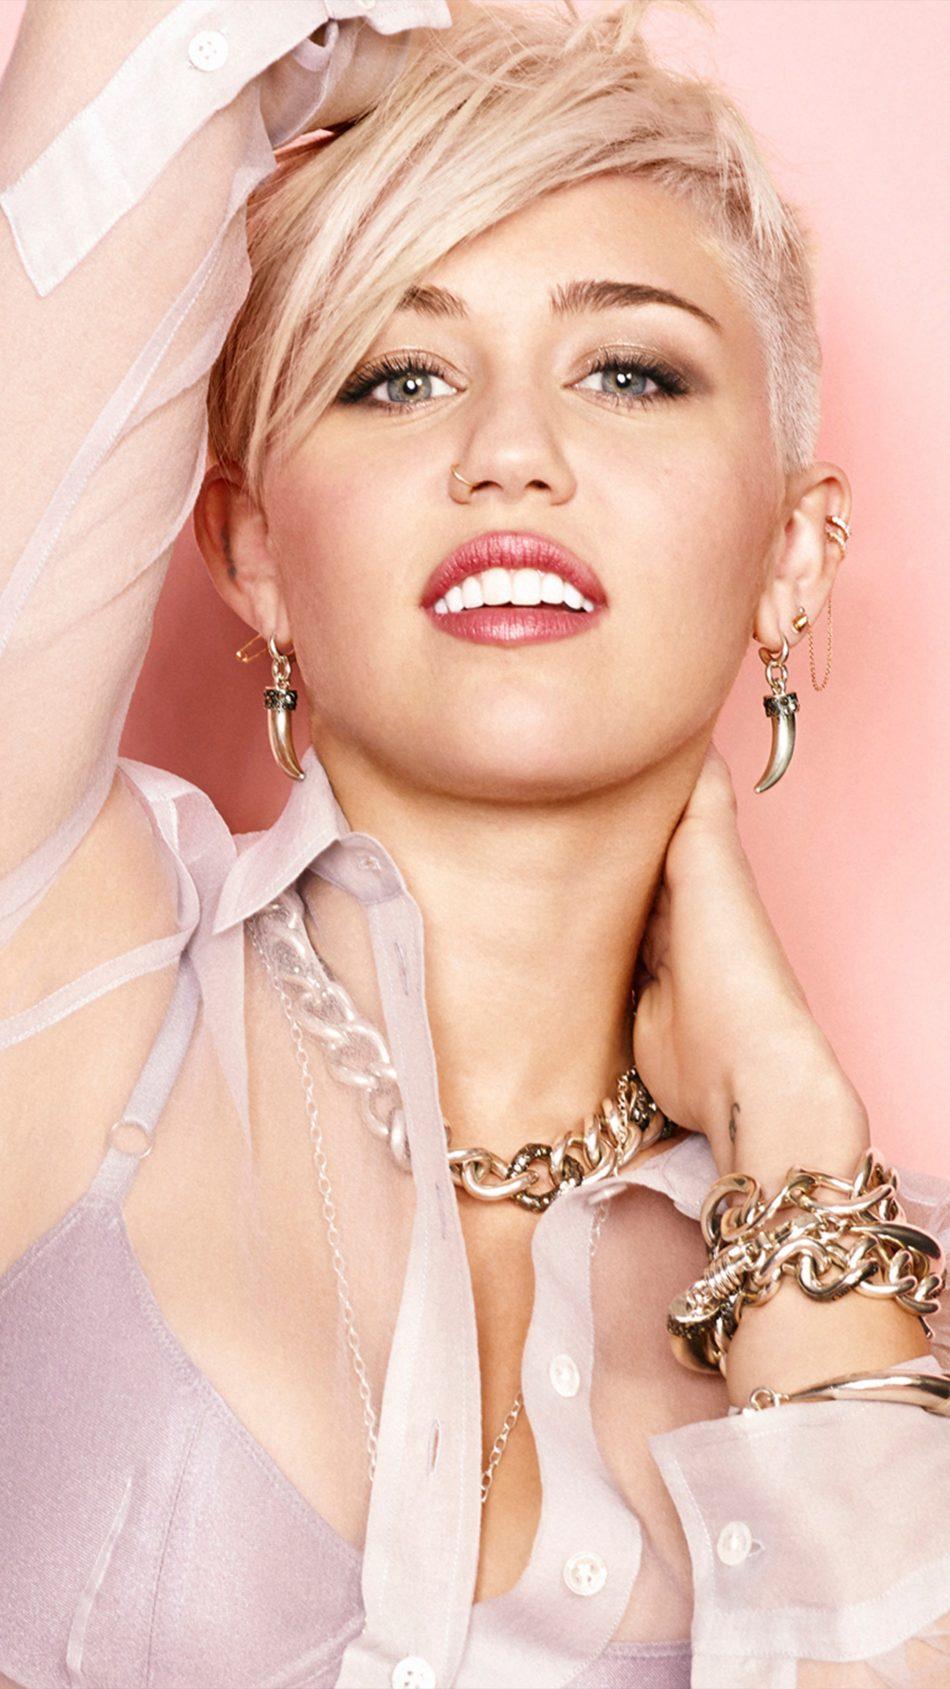 Miley Cyrus Cosmopolitan 2018 4K Ultra HD Mobile Wallpaper